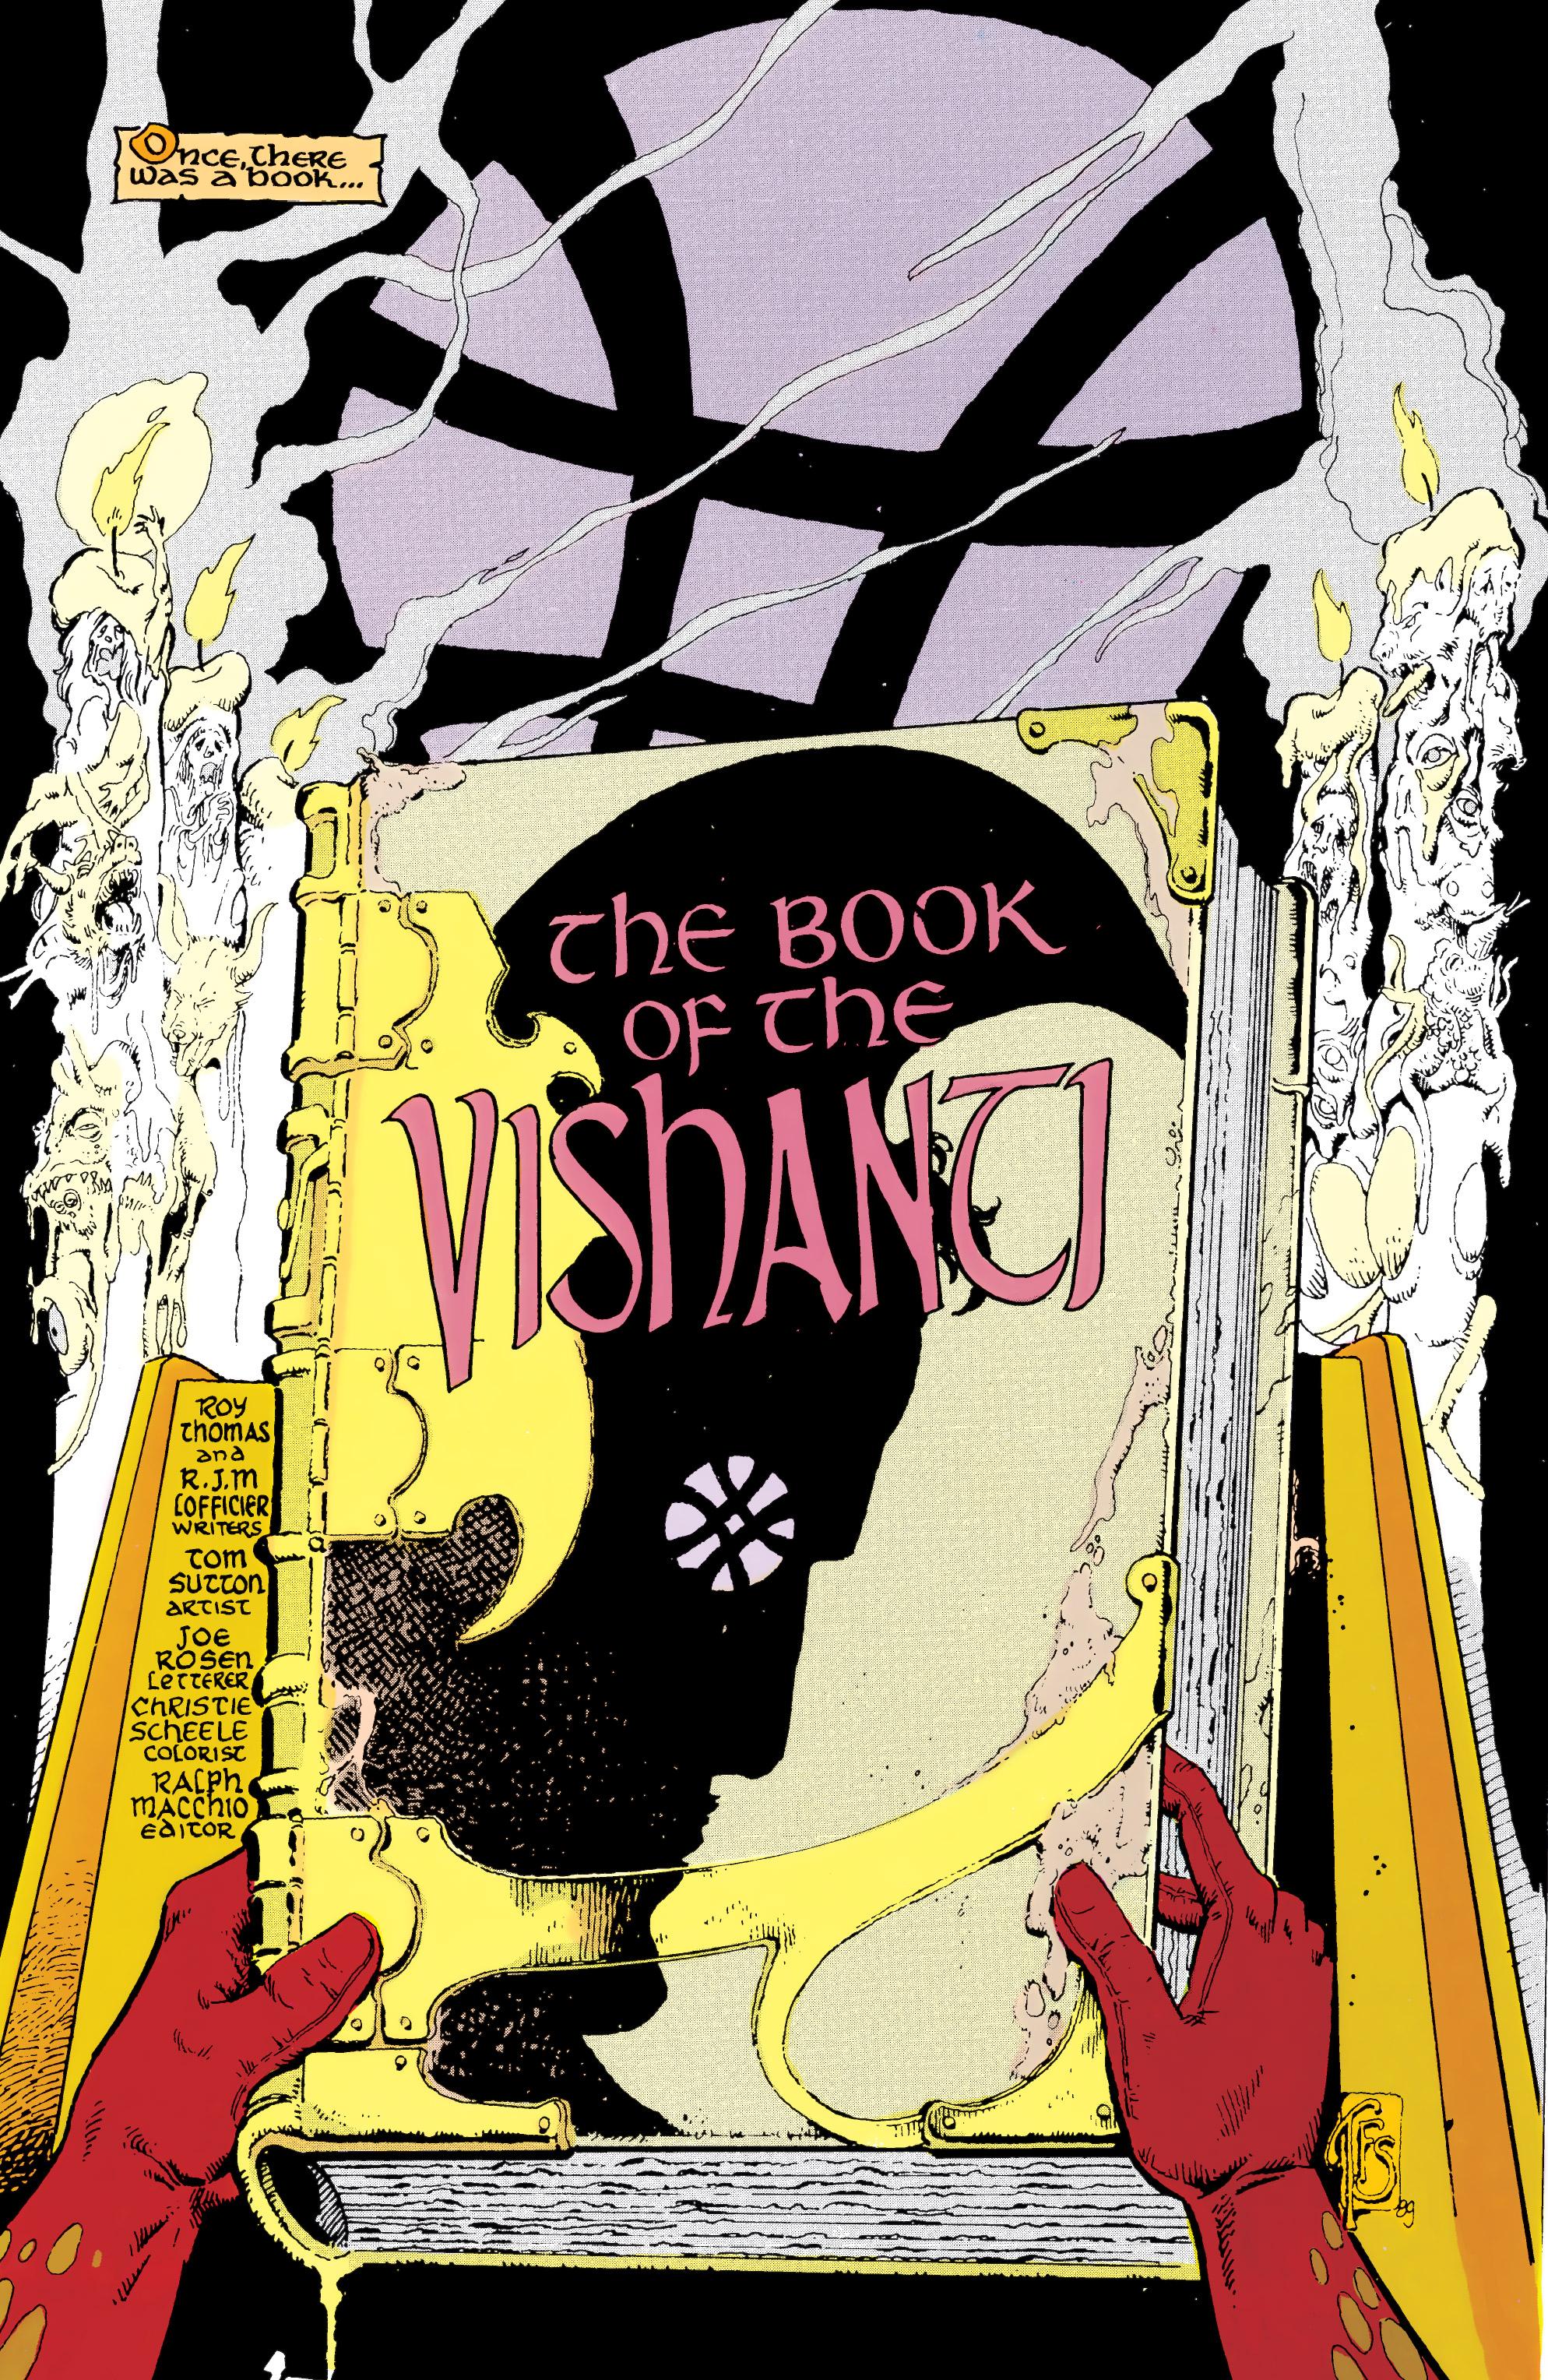 Book of the Vishanti